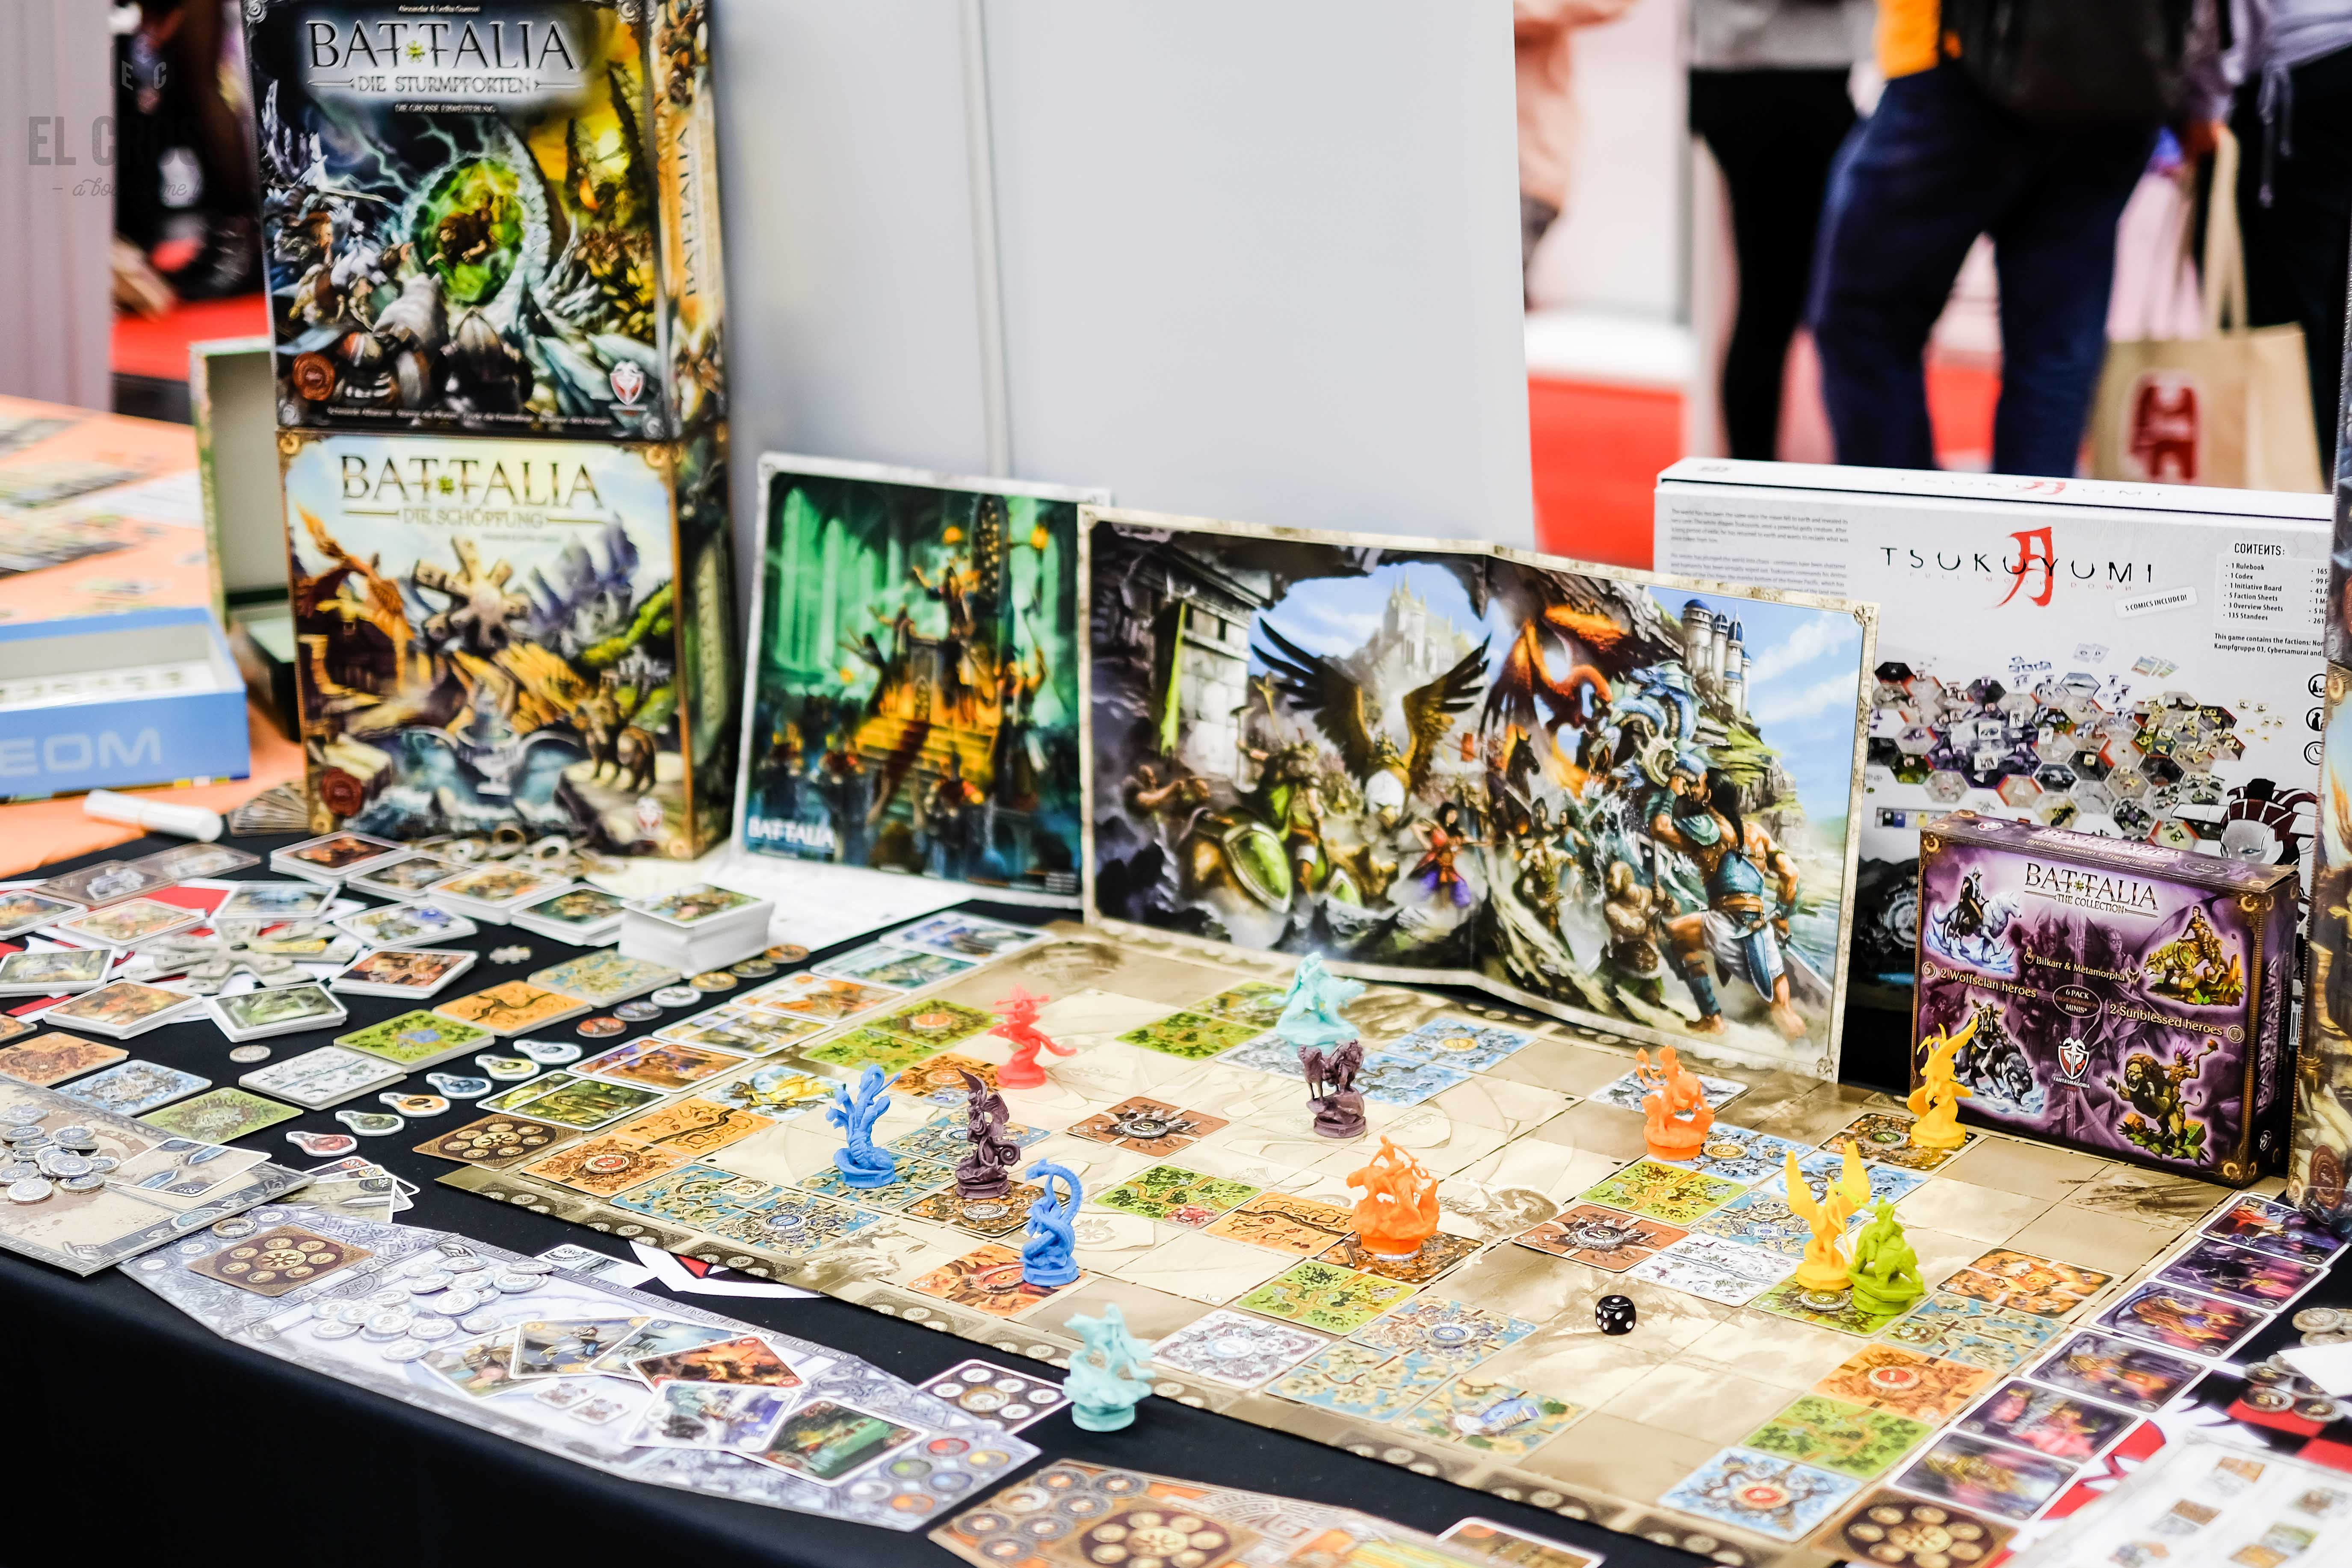 Spiel 2018 Battalia and expansions by Fantasmagoria